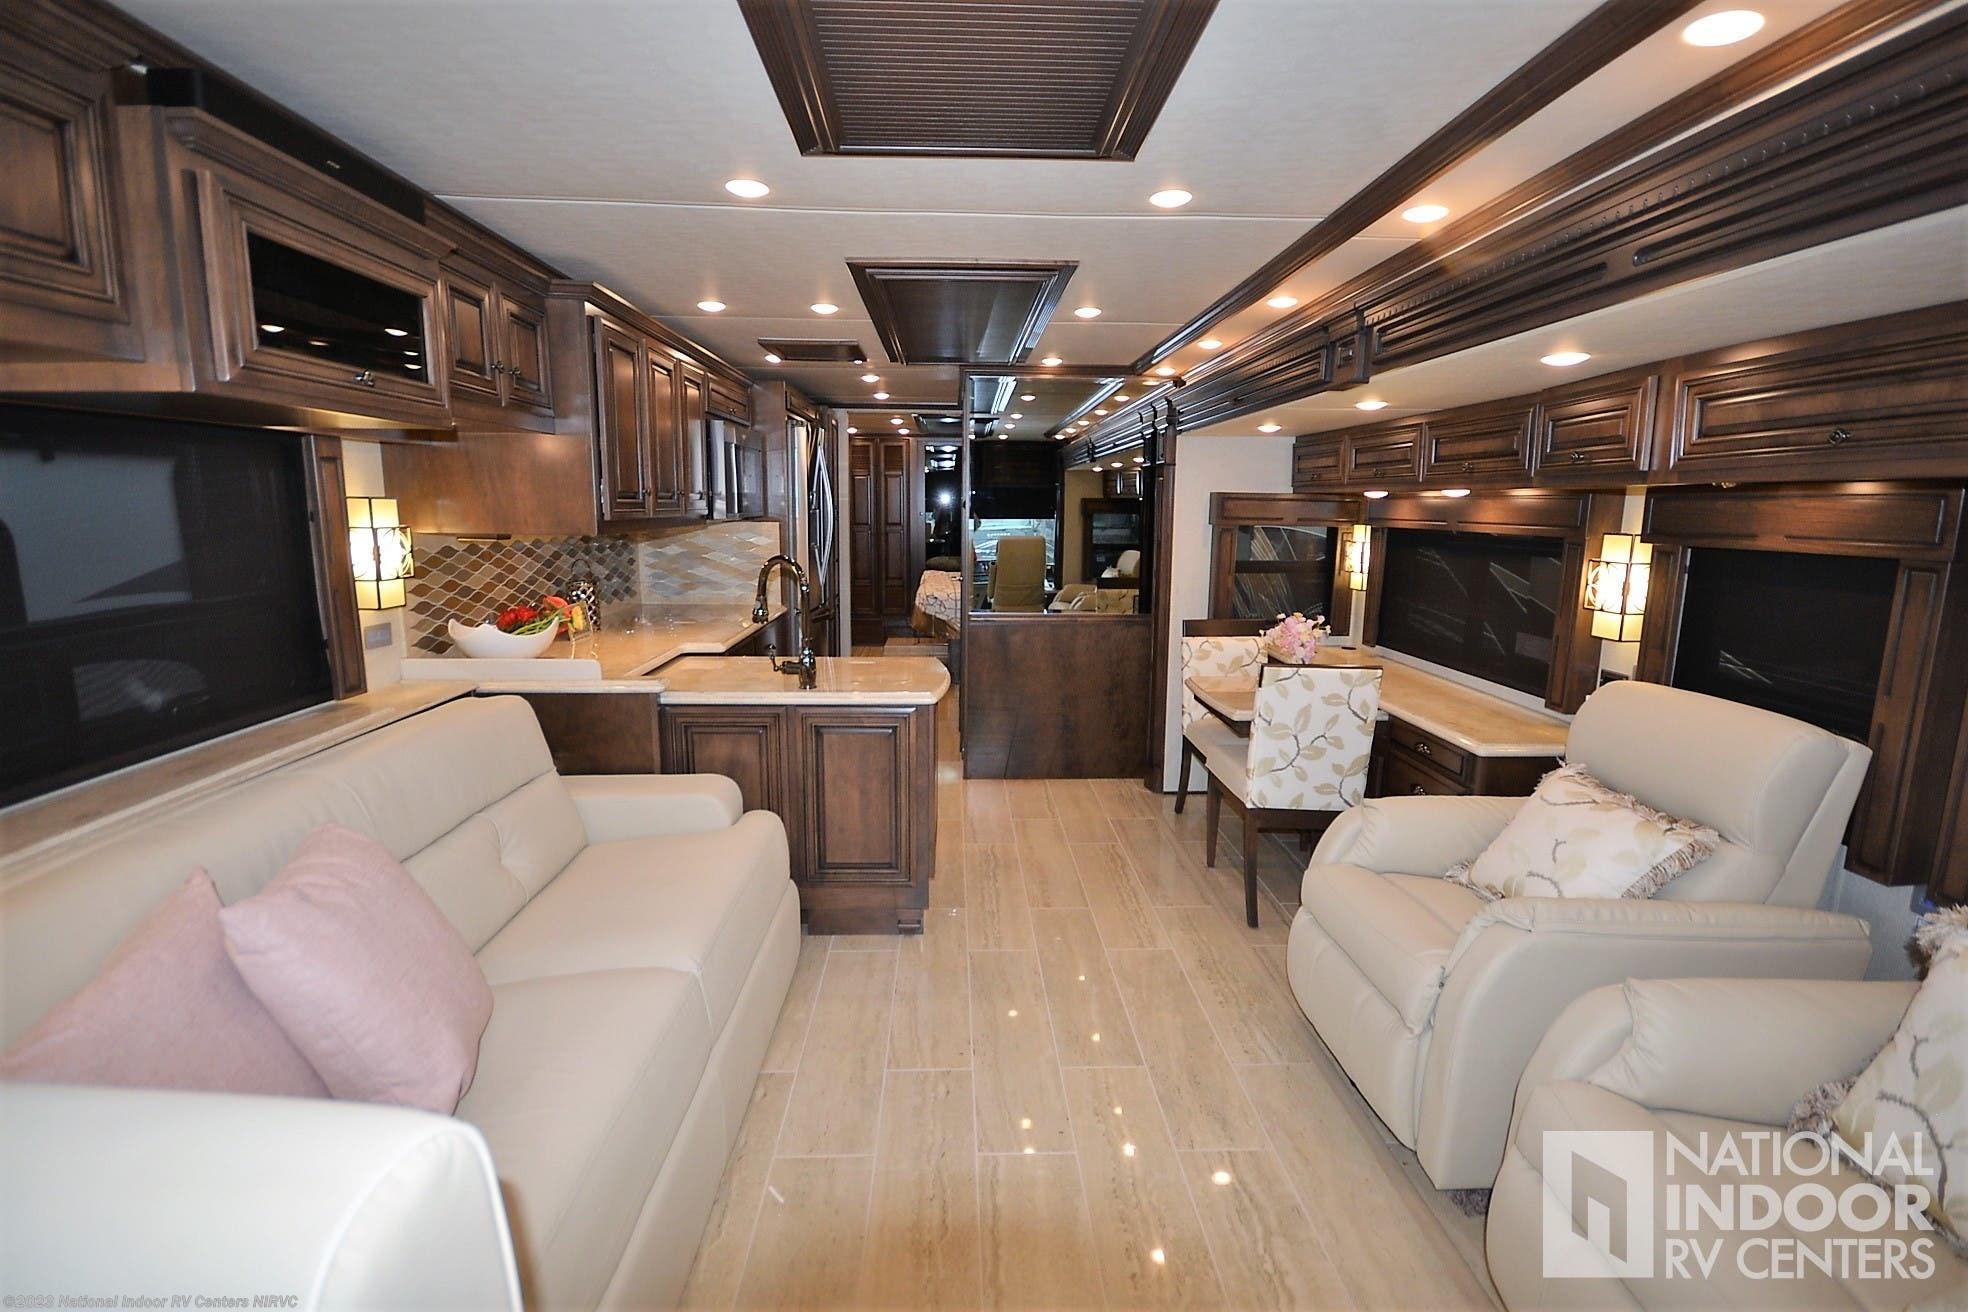 2019 Newmar RV Dutch Star 3717 for Sale in Lewisville, TX 75057 | 3491